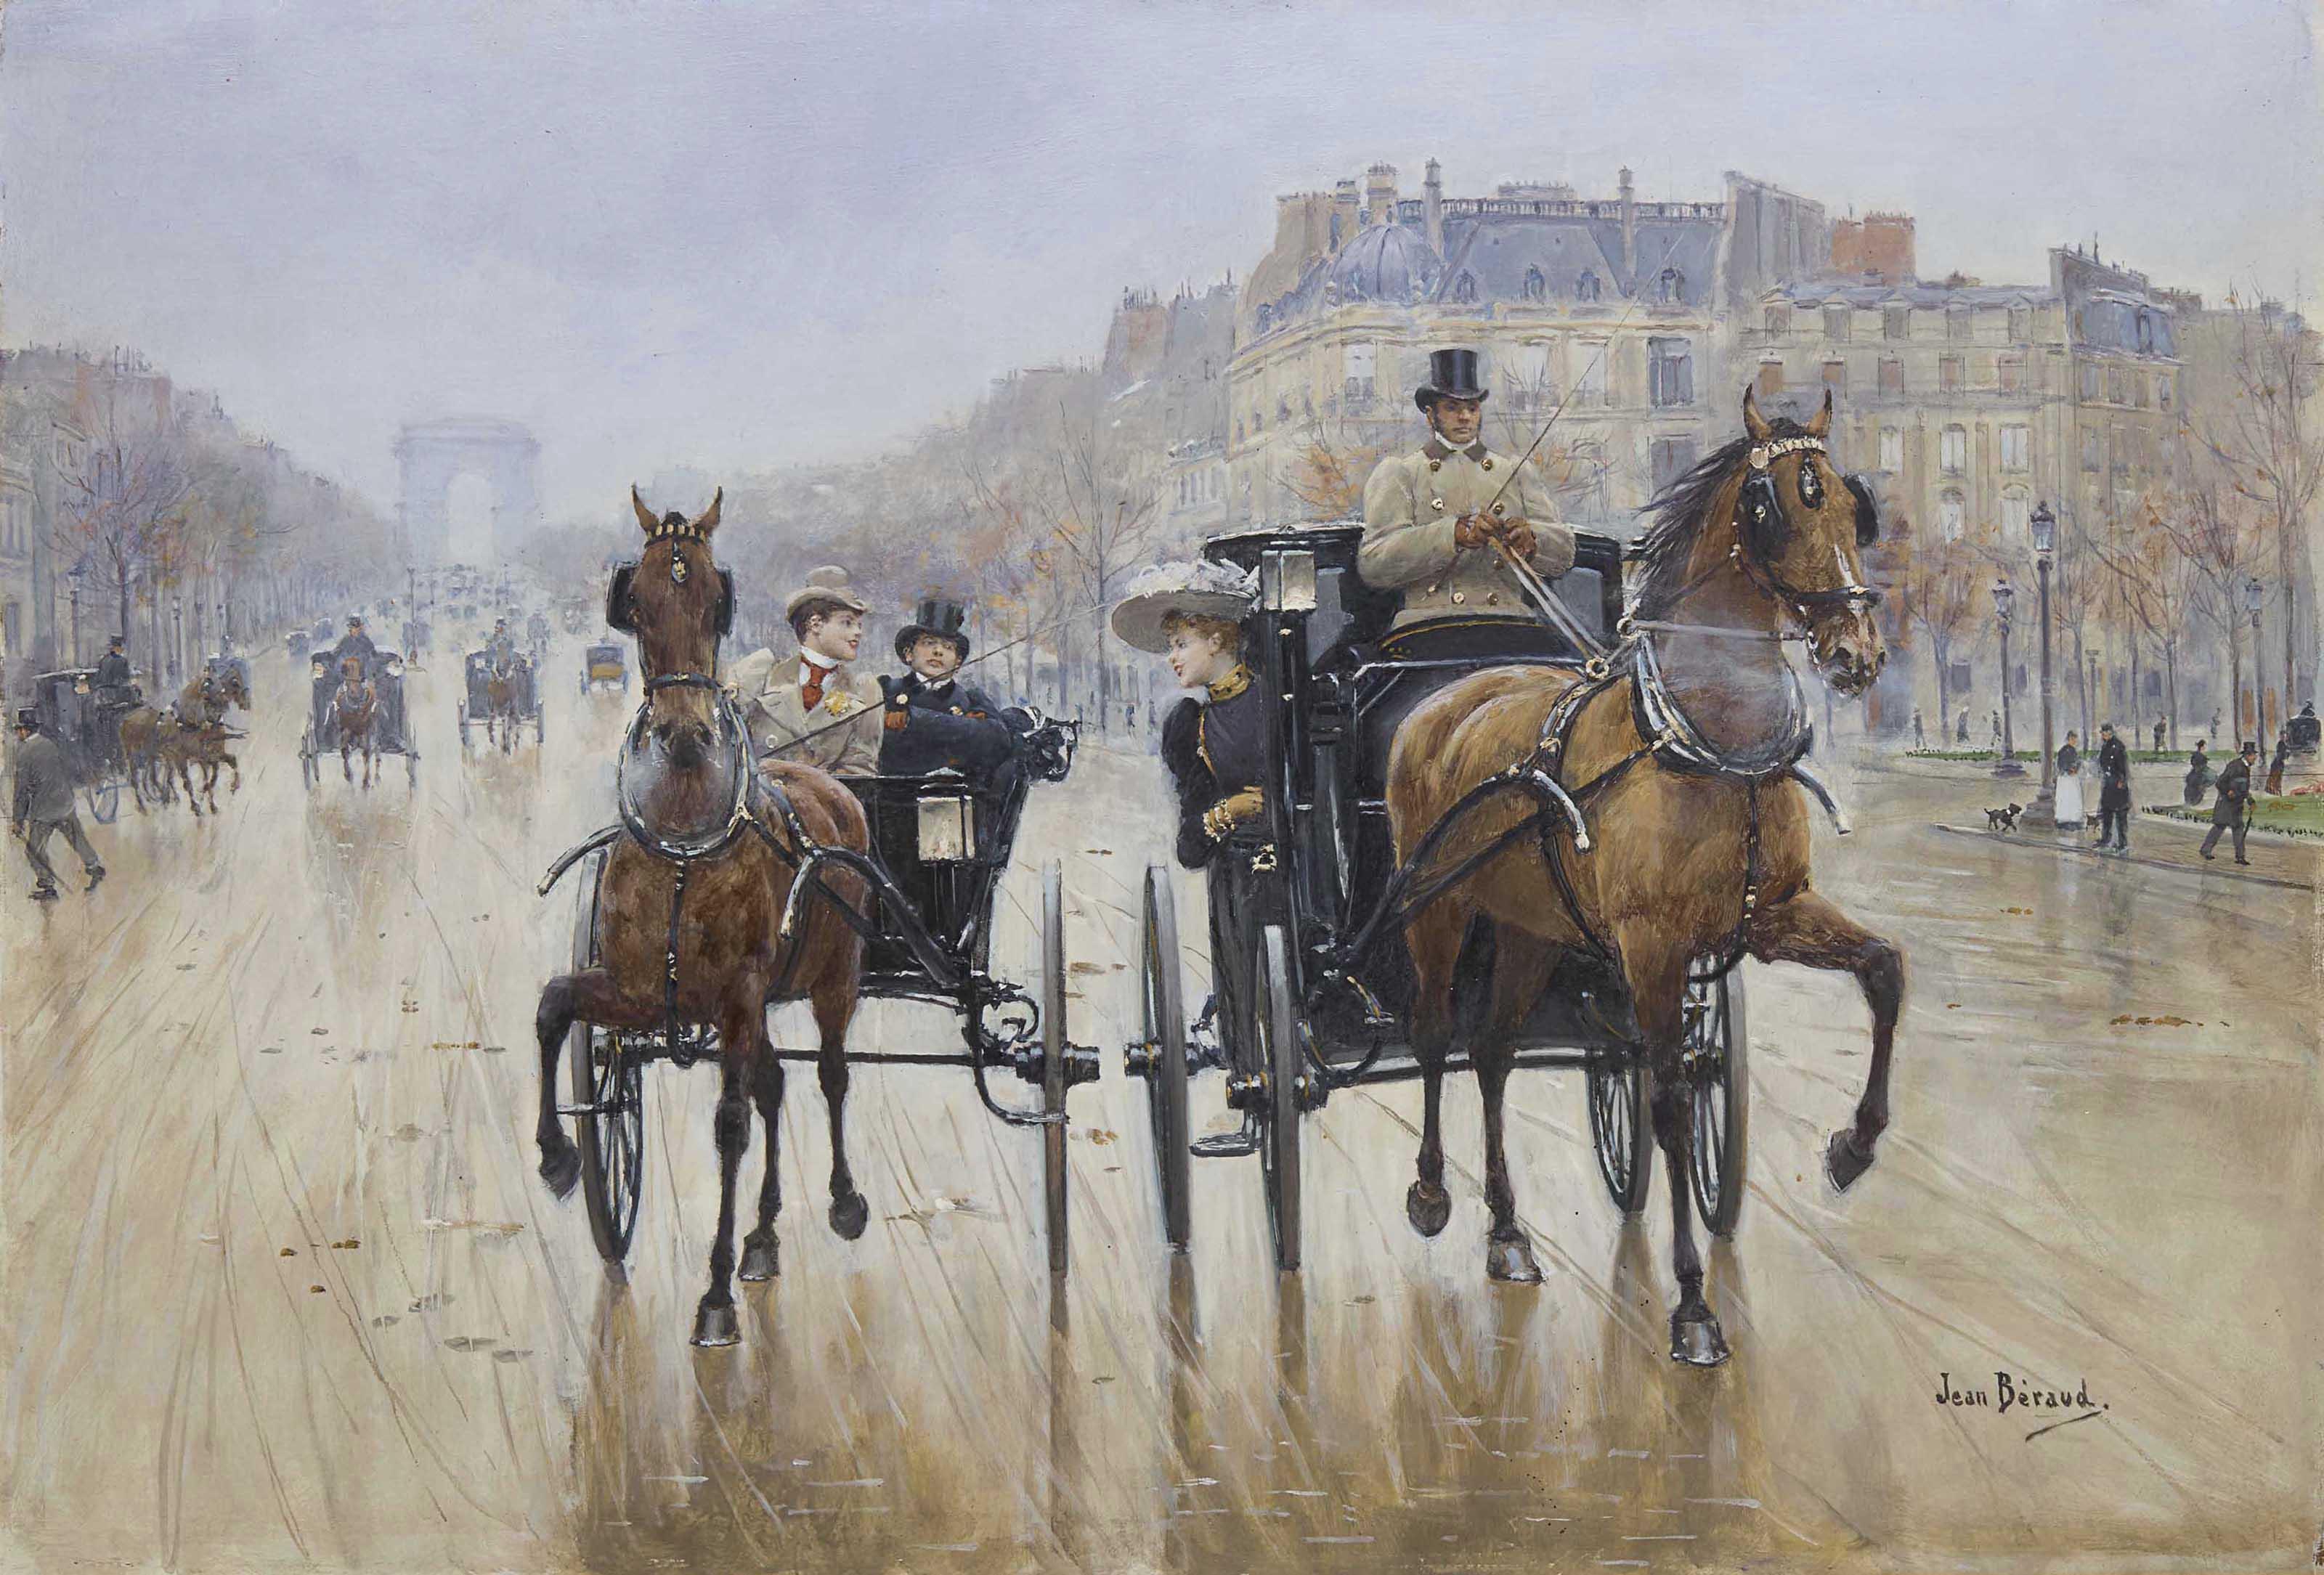 jean beraud classical art painting cityscape paris artwork horse